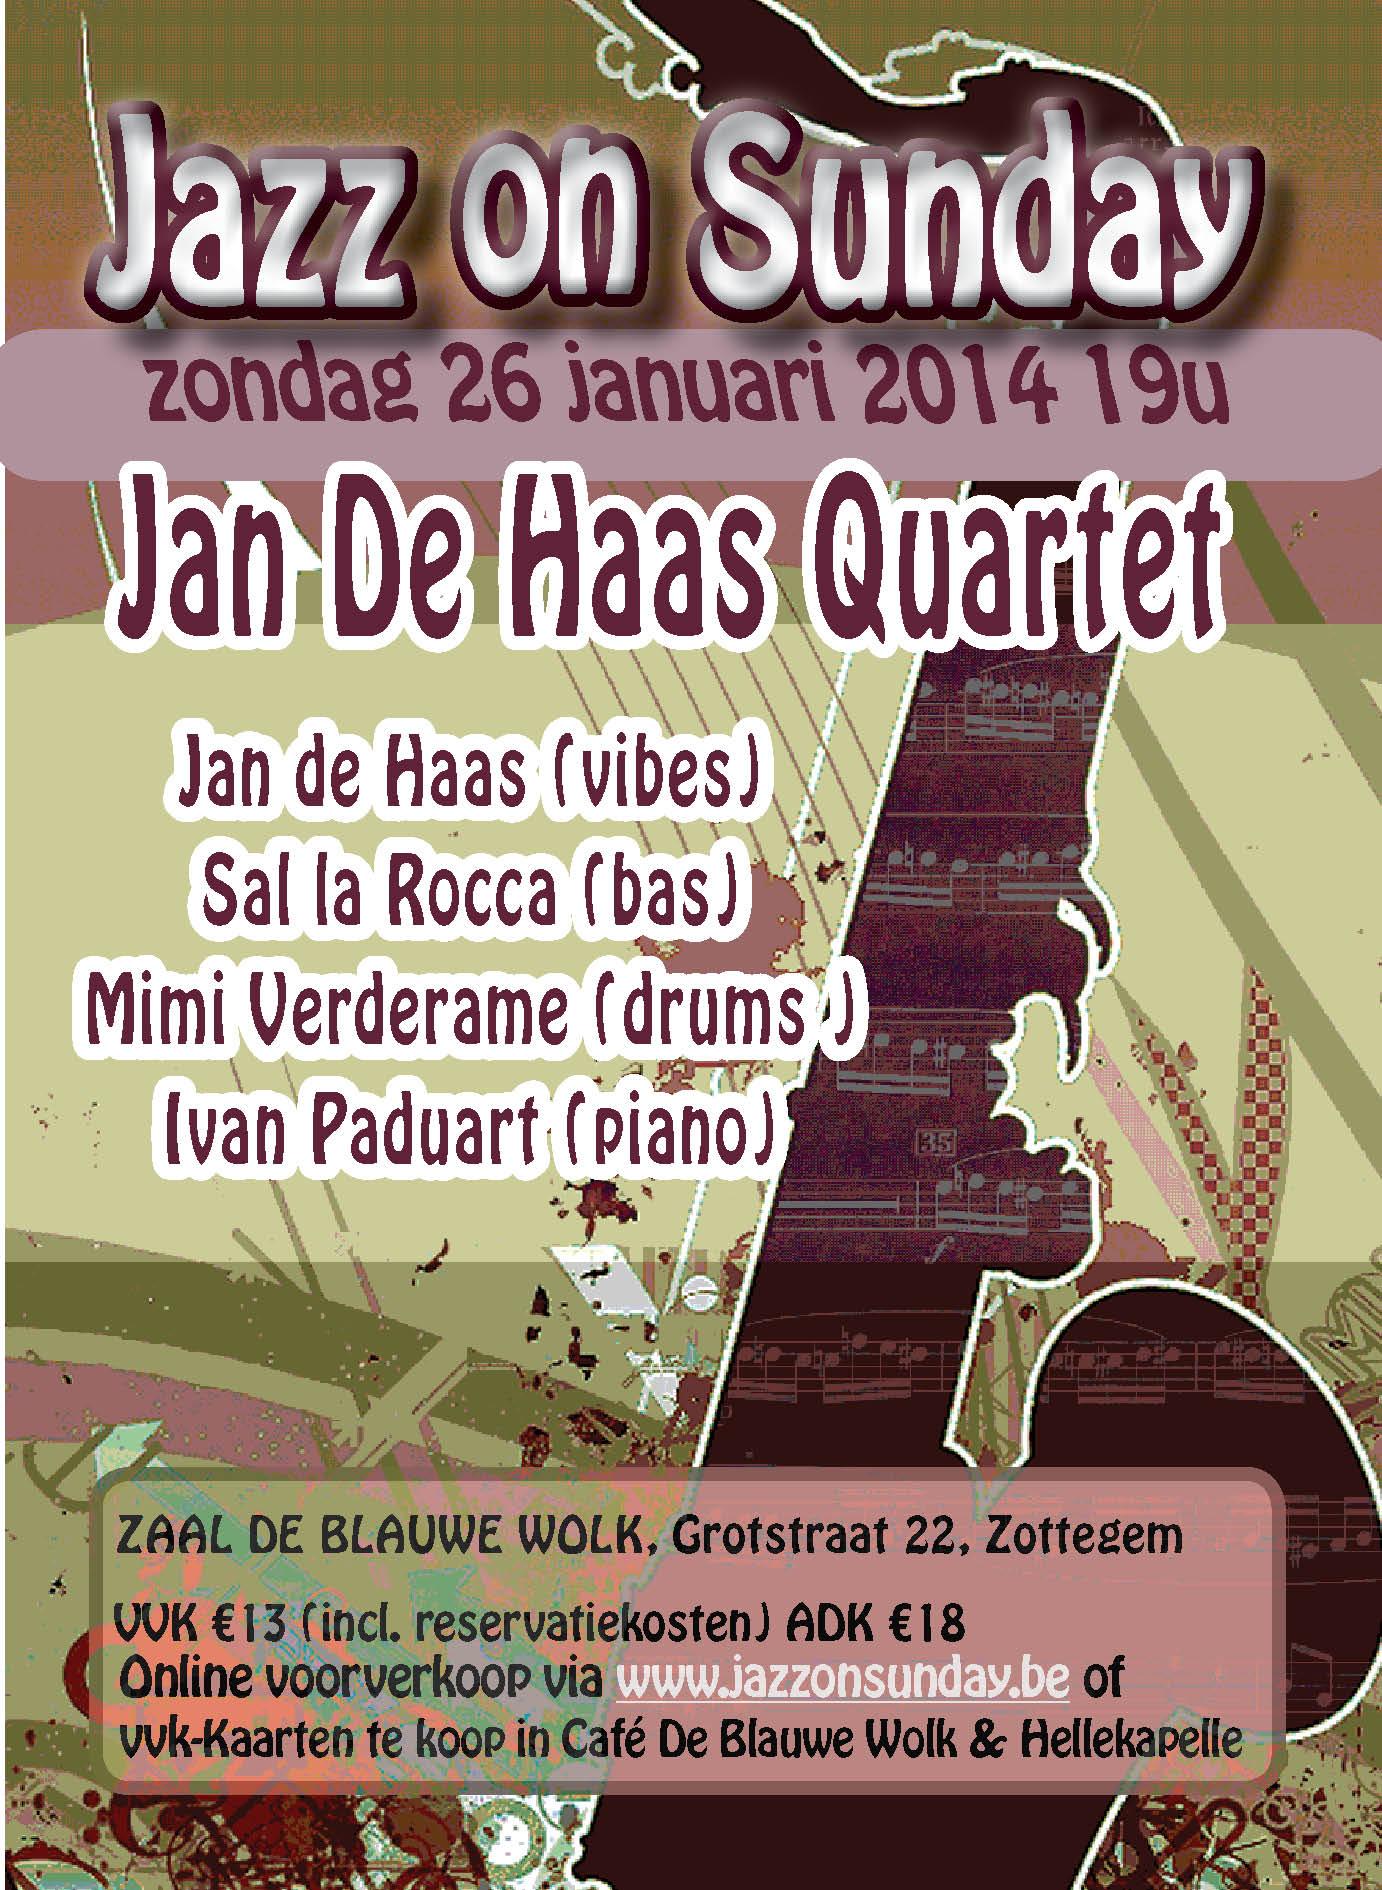 affiche jos 26 januari 2014 Jan De Haas web